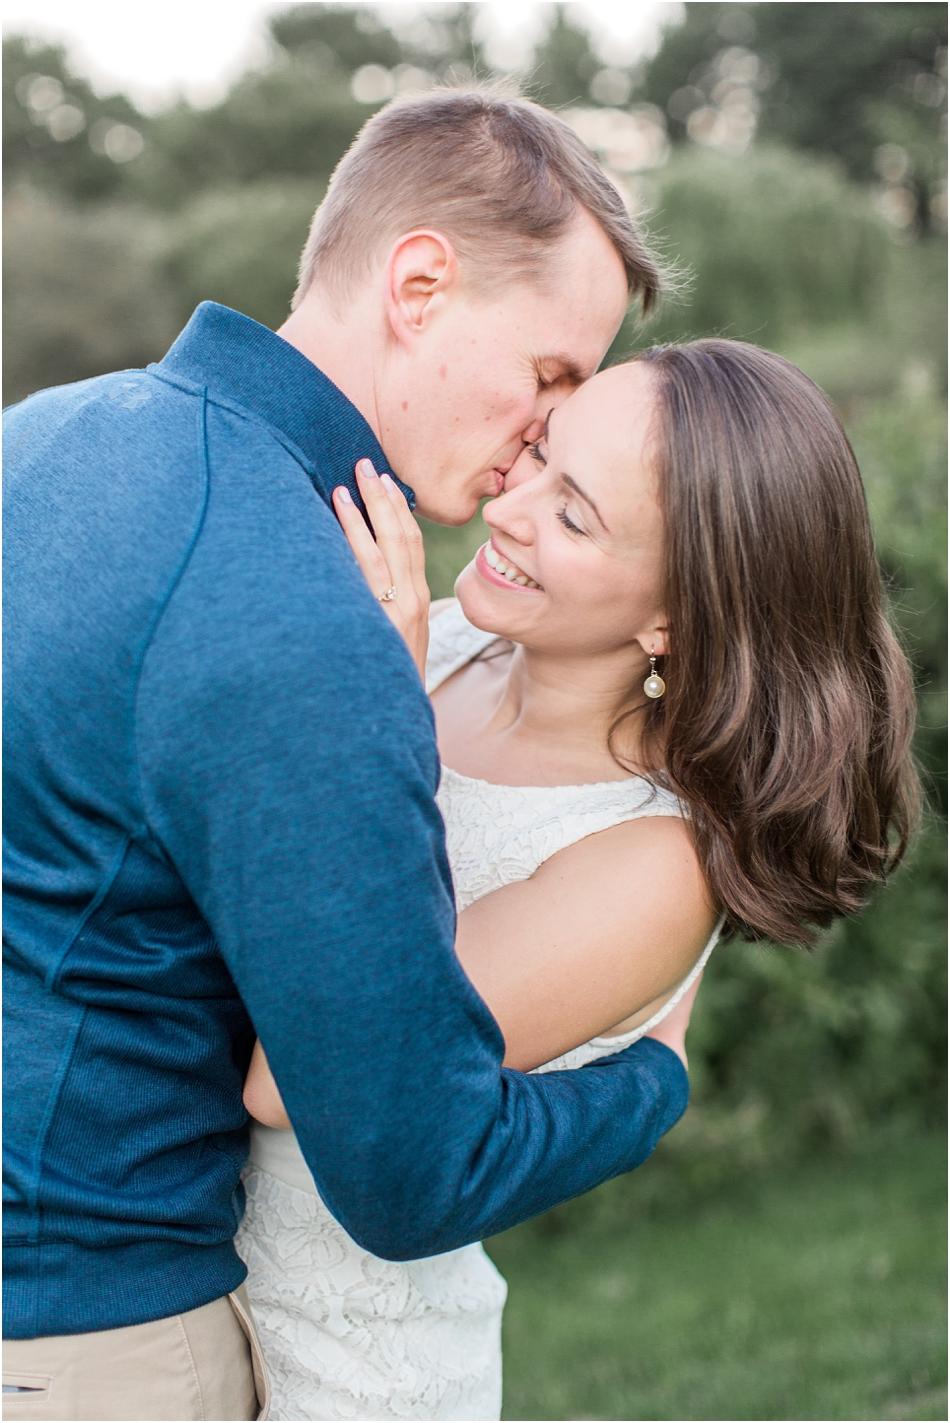 arnold_arboretum_engagement_dylan_mariana_cape_cod_boston_new_england_wedding_photographer_Meredith_Jane_Photography_photo_2668.jpg